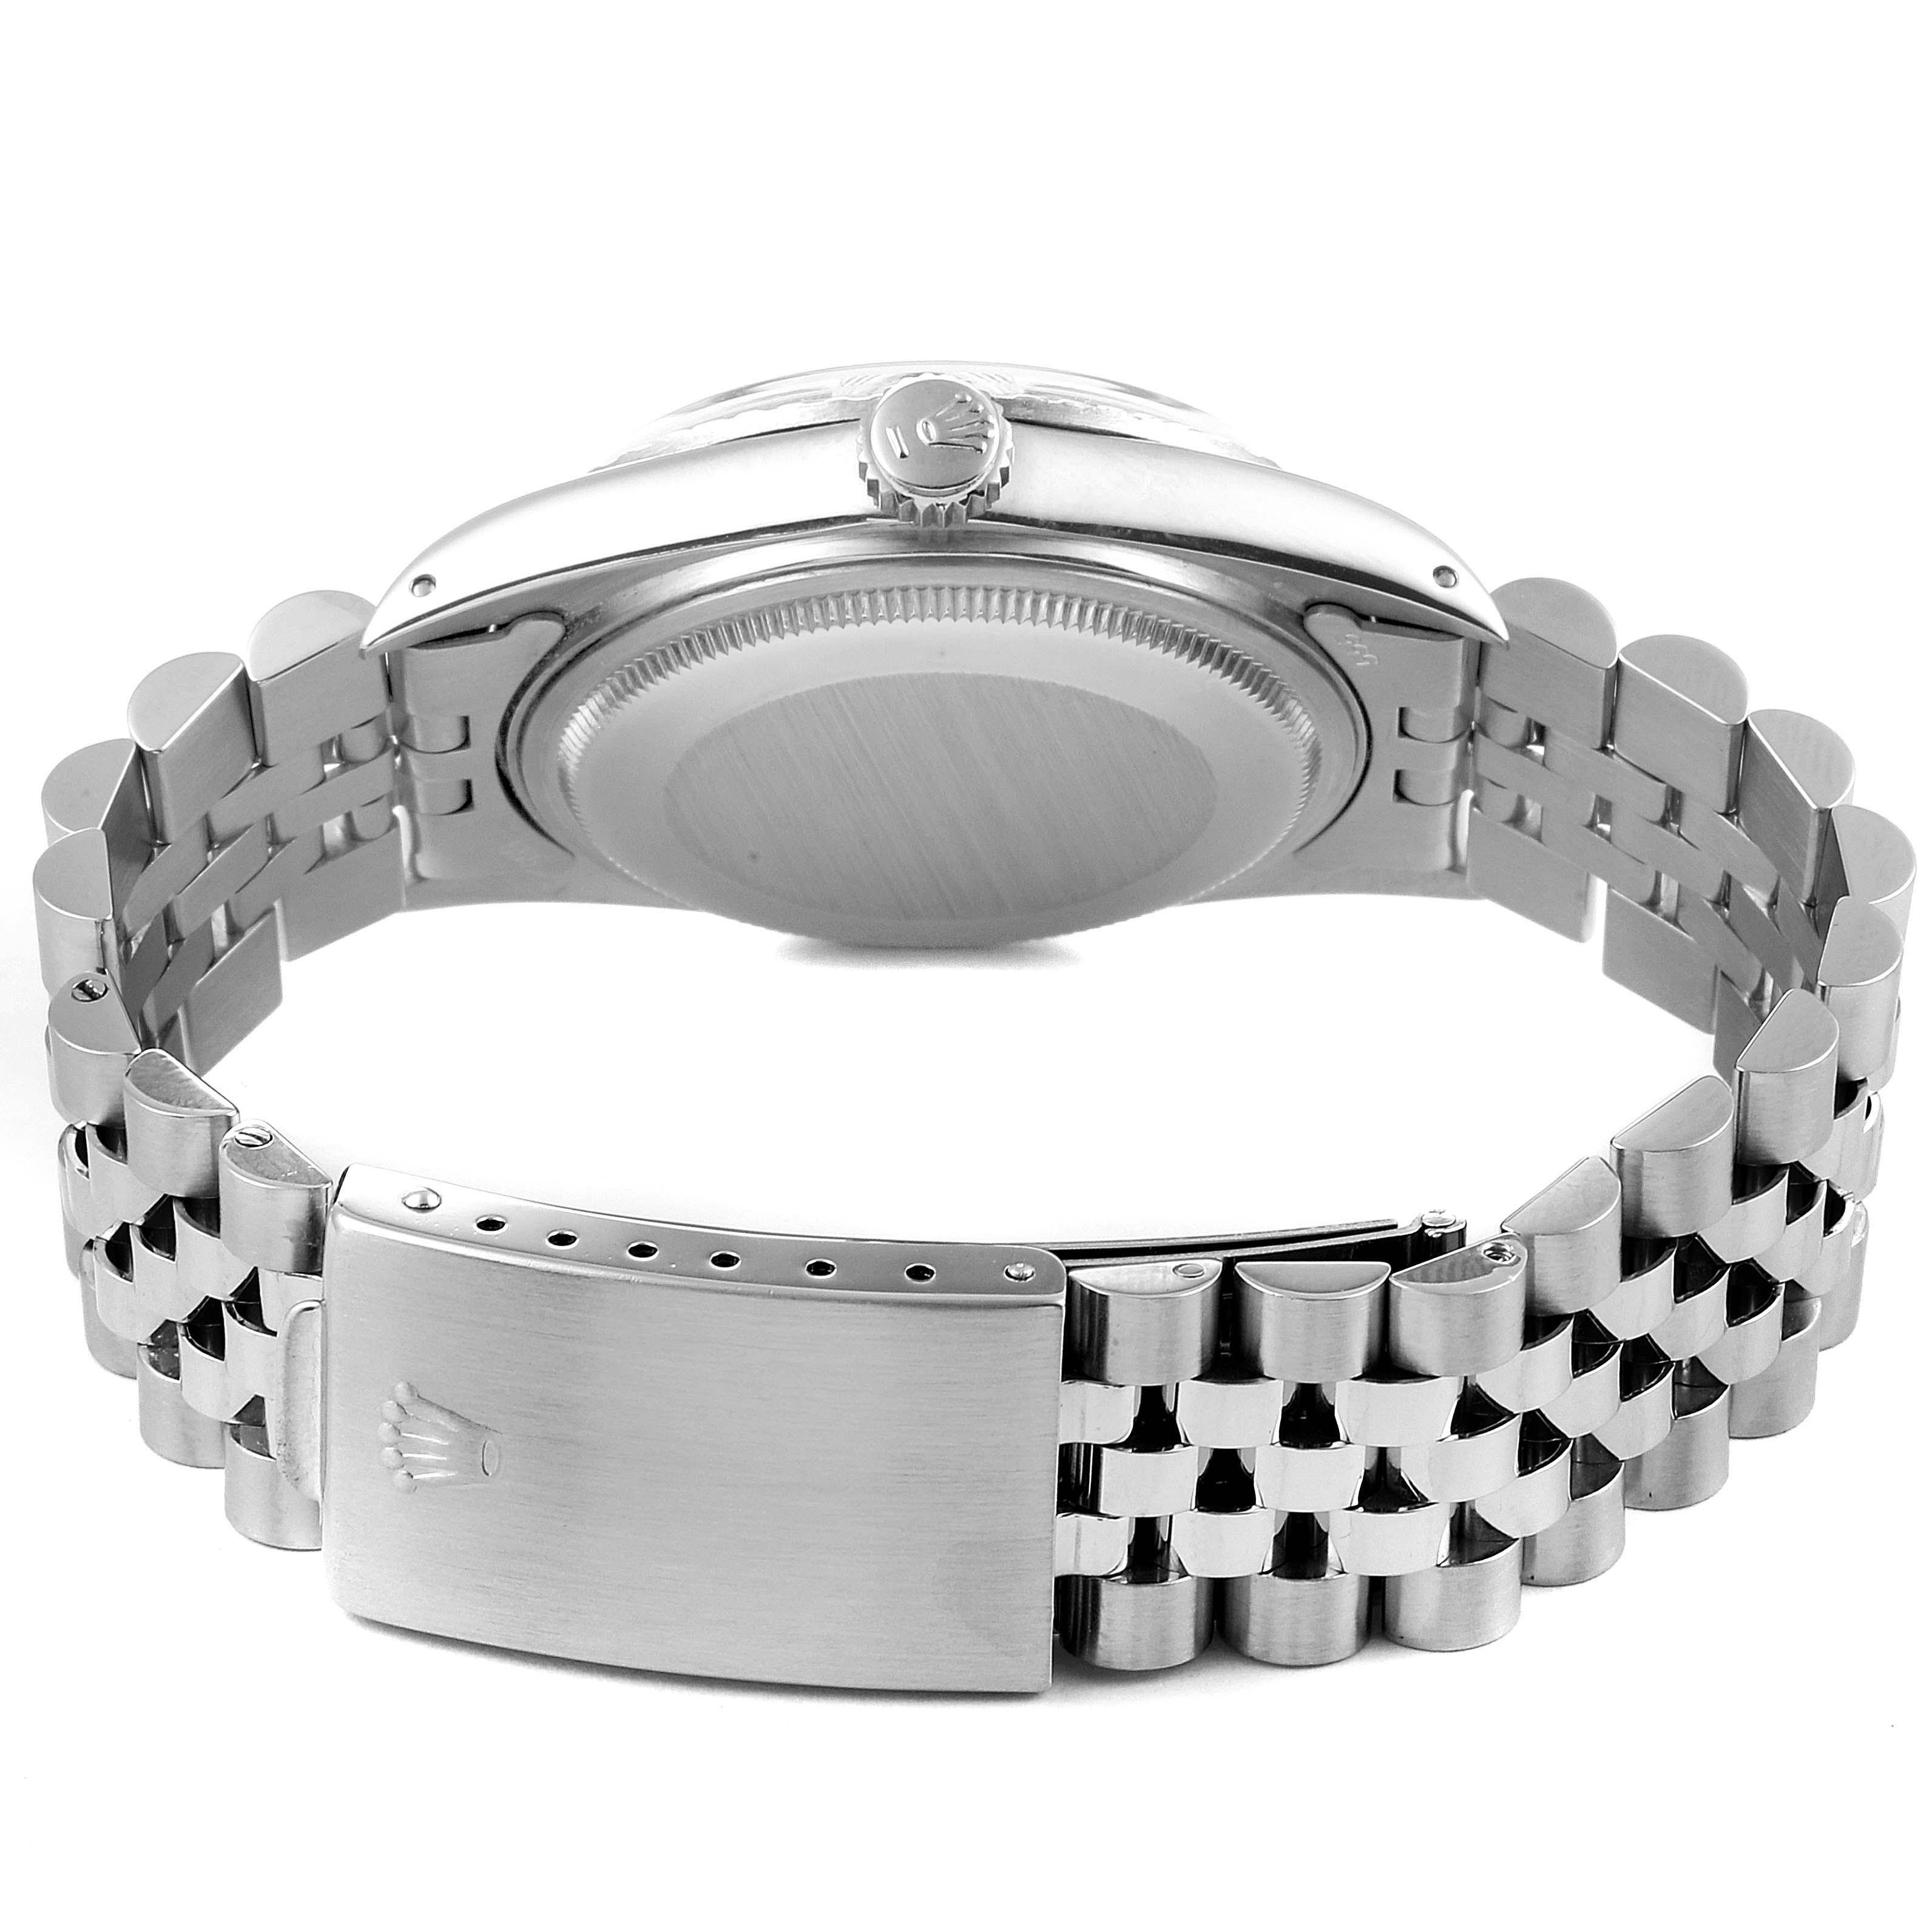 Rolex Datejust Silver Dial Vintage Steel Mens Watch 16030 SwissWatchExpo